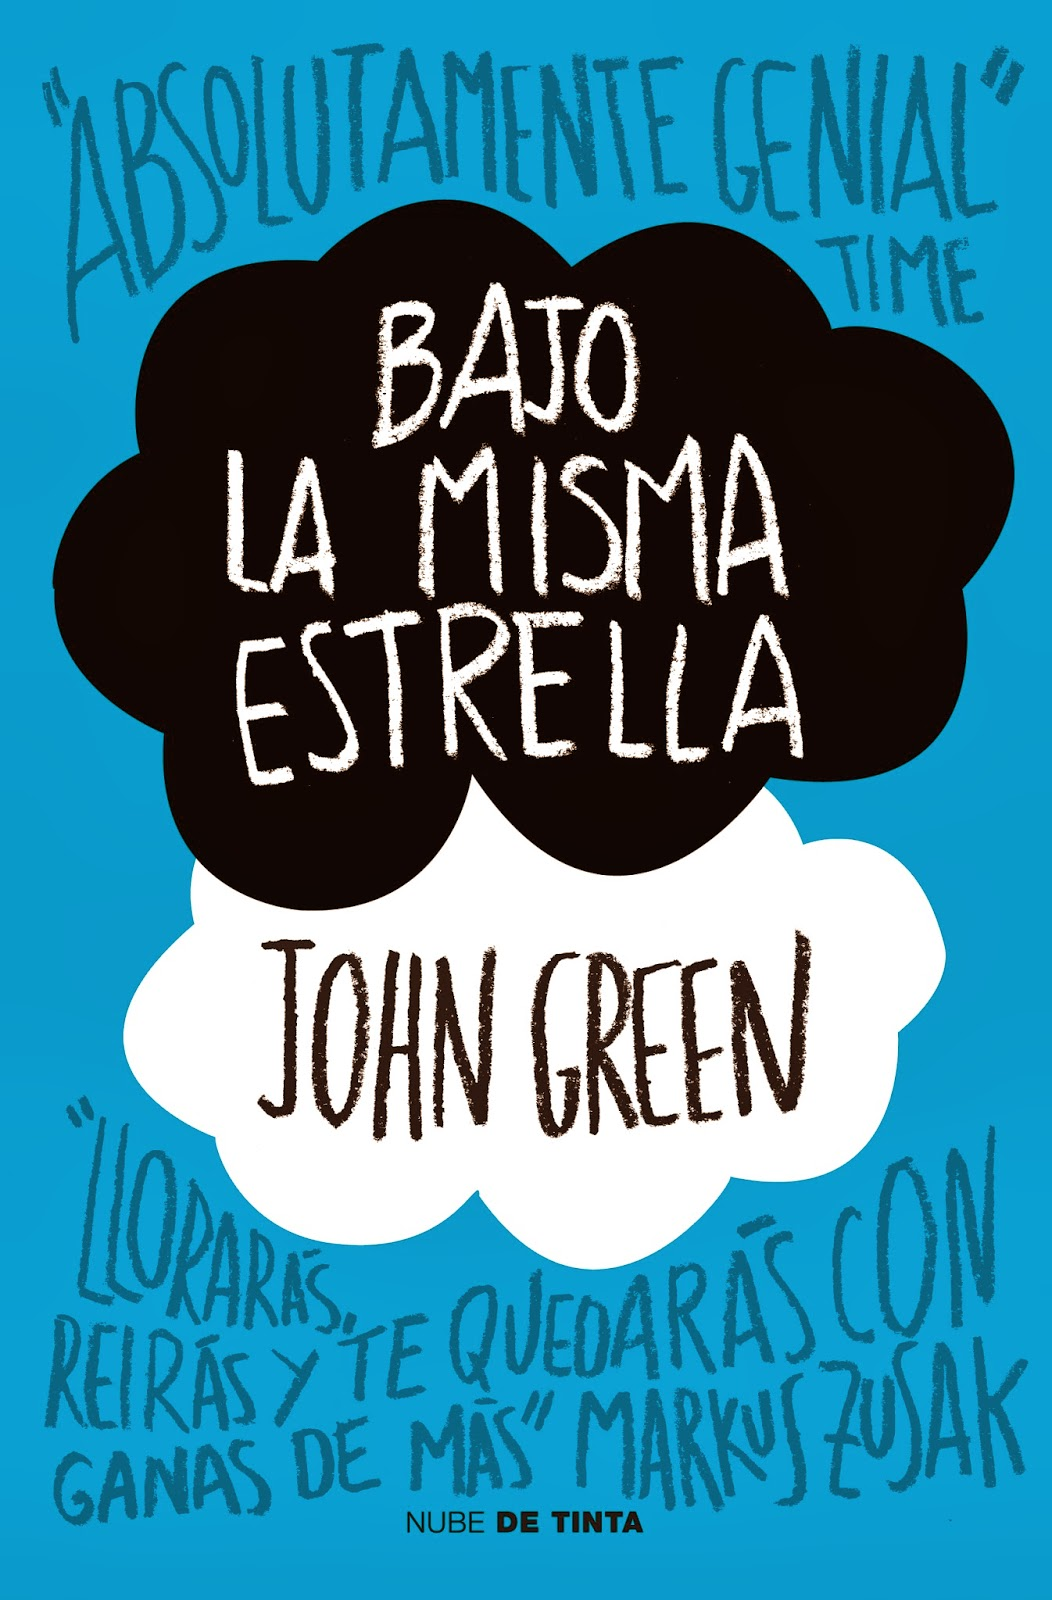 http://laorilladeloslibross.blogspot.com.es/2014/03/bajo-la-misma-estrella-john-green.html